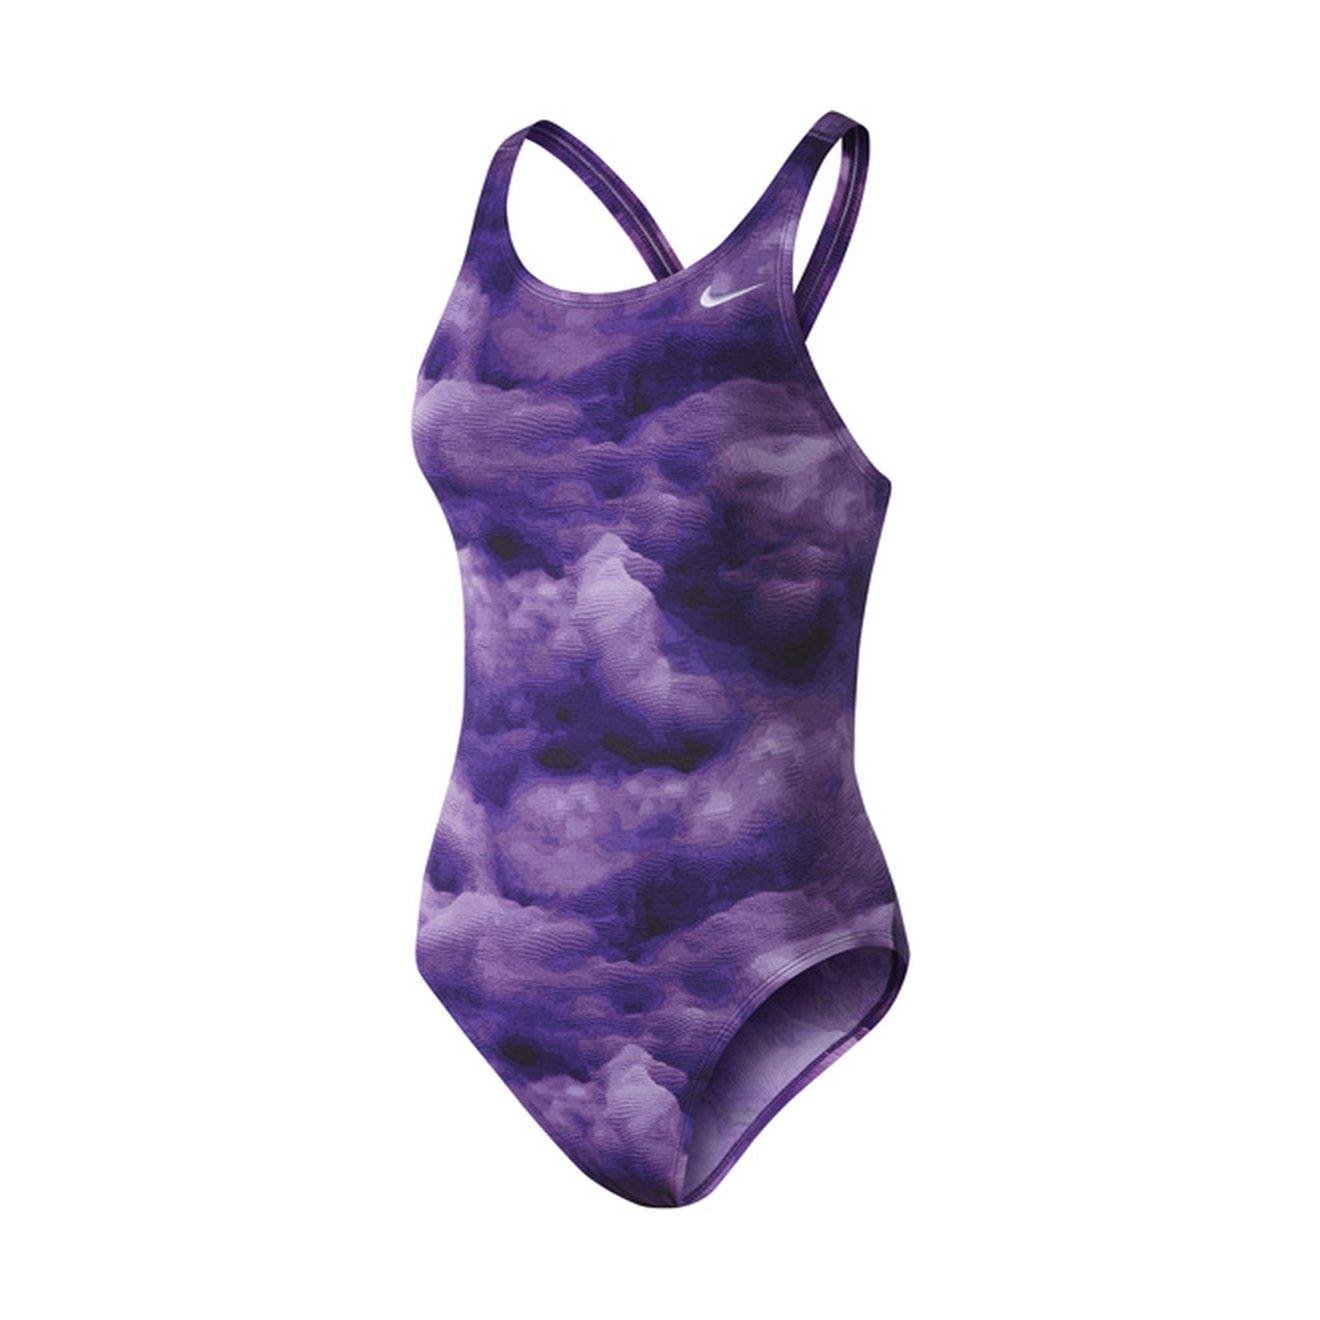 57aee27483ea Amazon.com  Nike Women s Cloud Fast Back Tank Swimsuit  Clothing